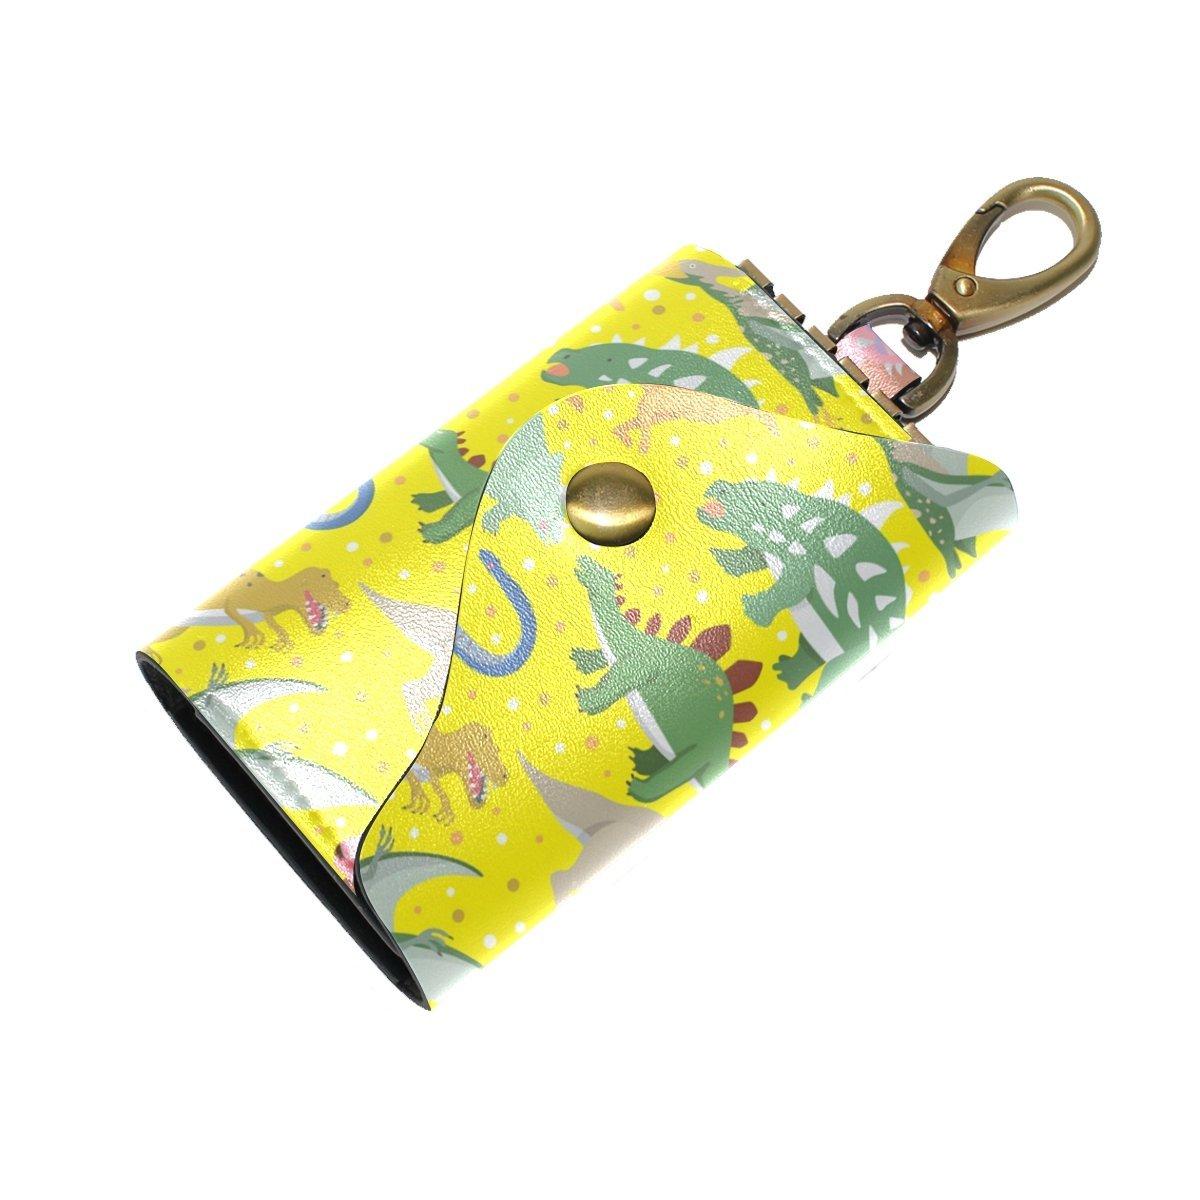 DEYYA Dinosaur Leather Key Case Wallets Unisex Keychain Key Holder with 6 Hooks Snap Closure